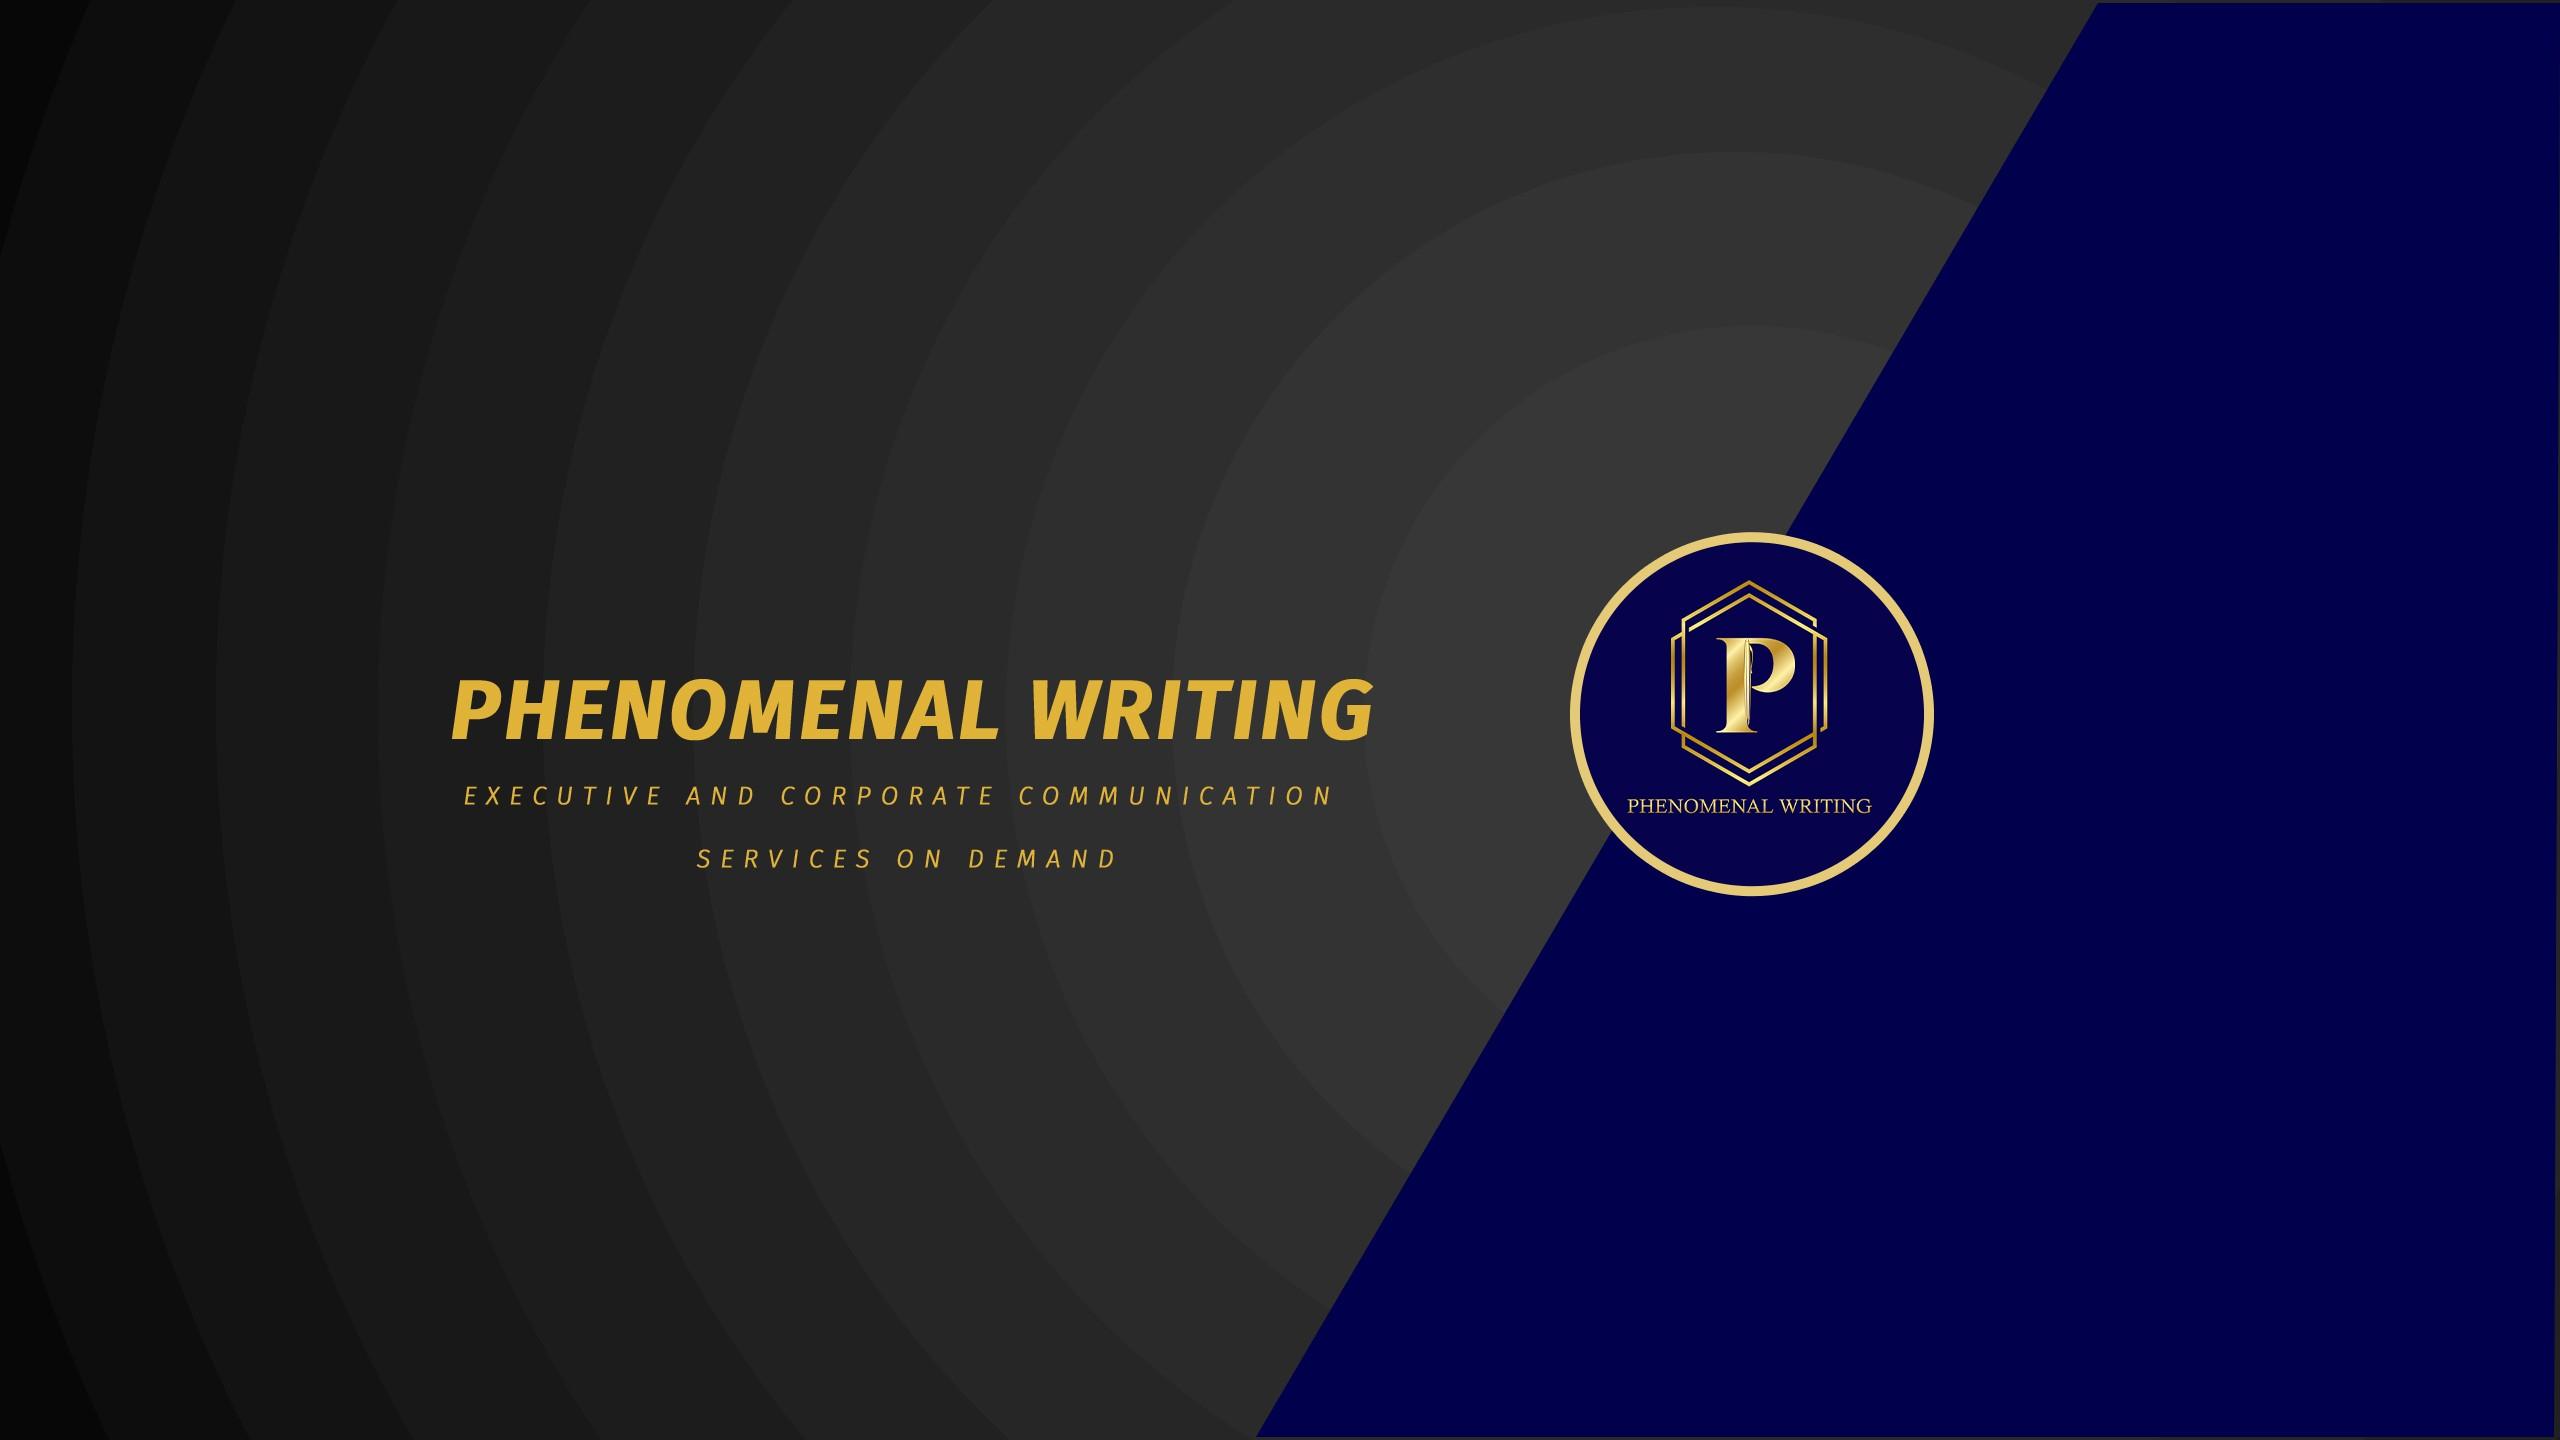 Writing companies in atlanta